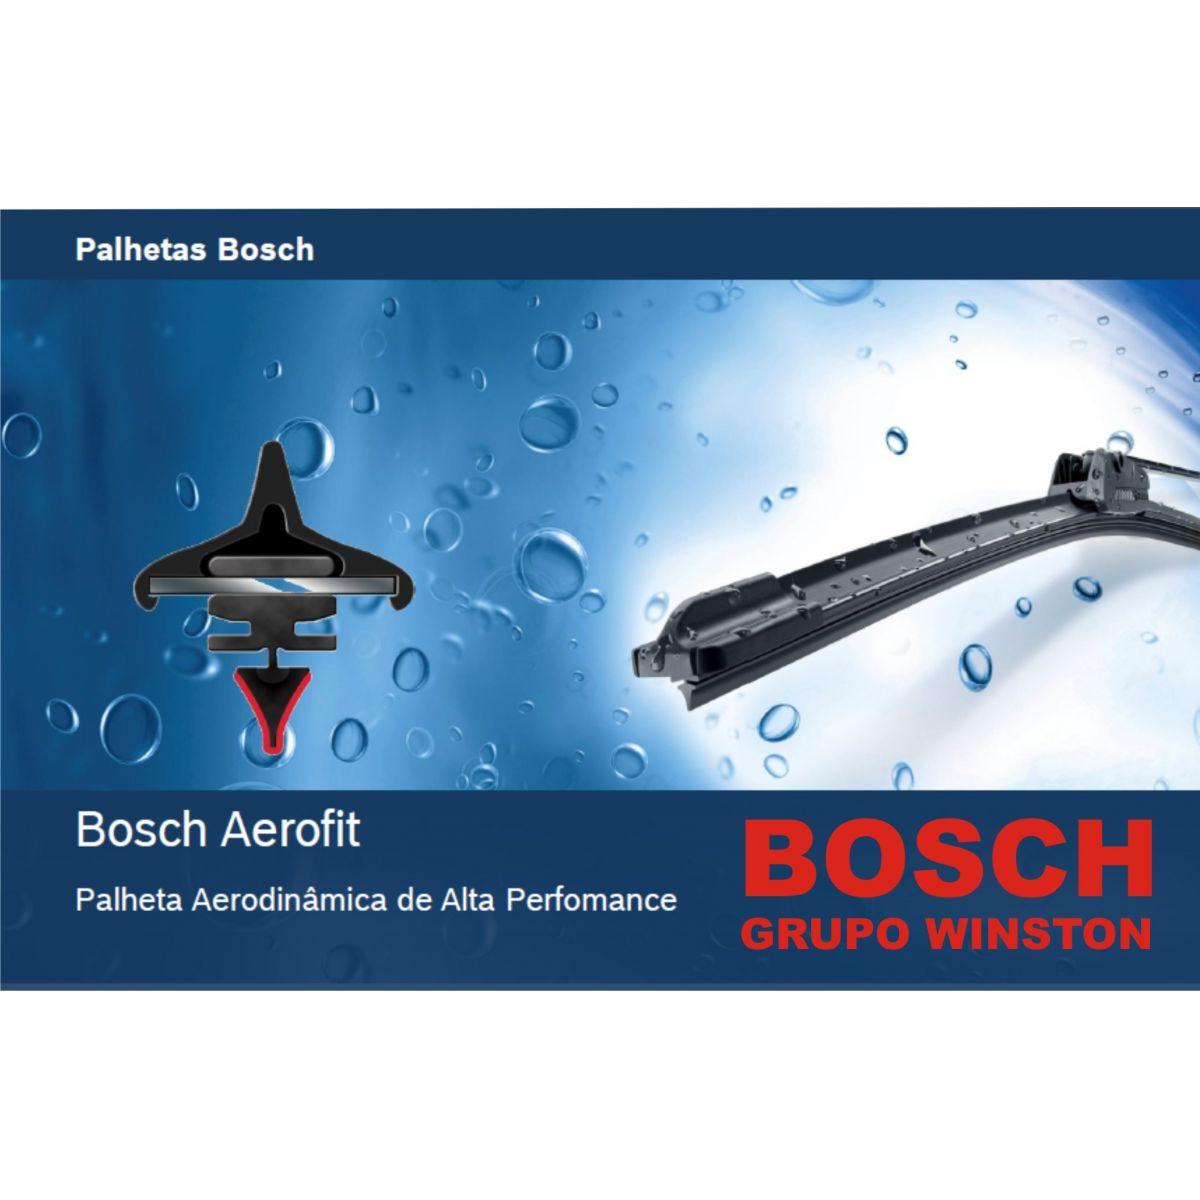 Palheta Bosch Aerofit Limpador de para brisa Bosch JEEP Cherokee Liberty